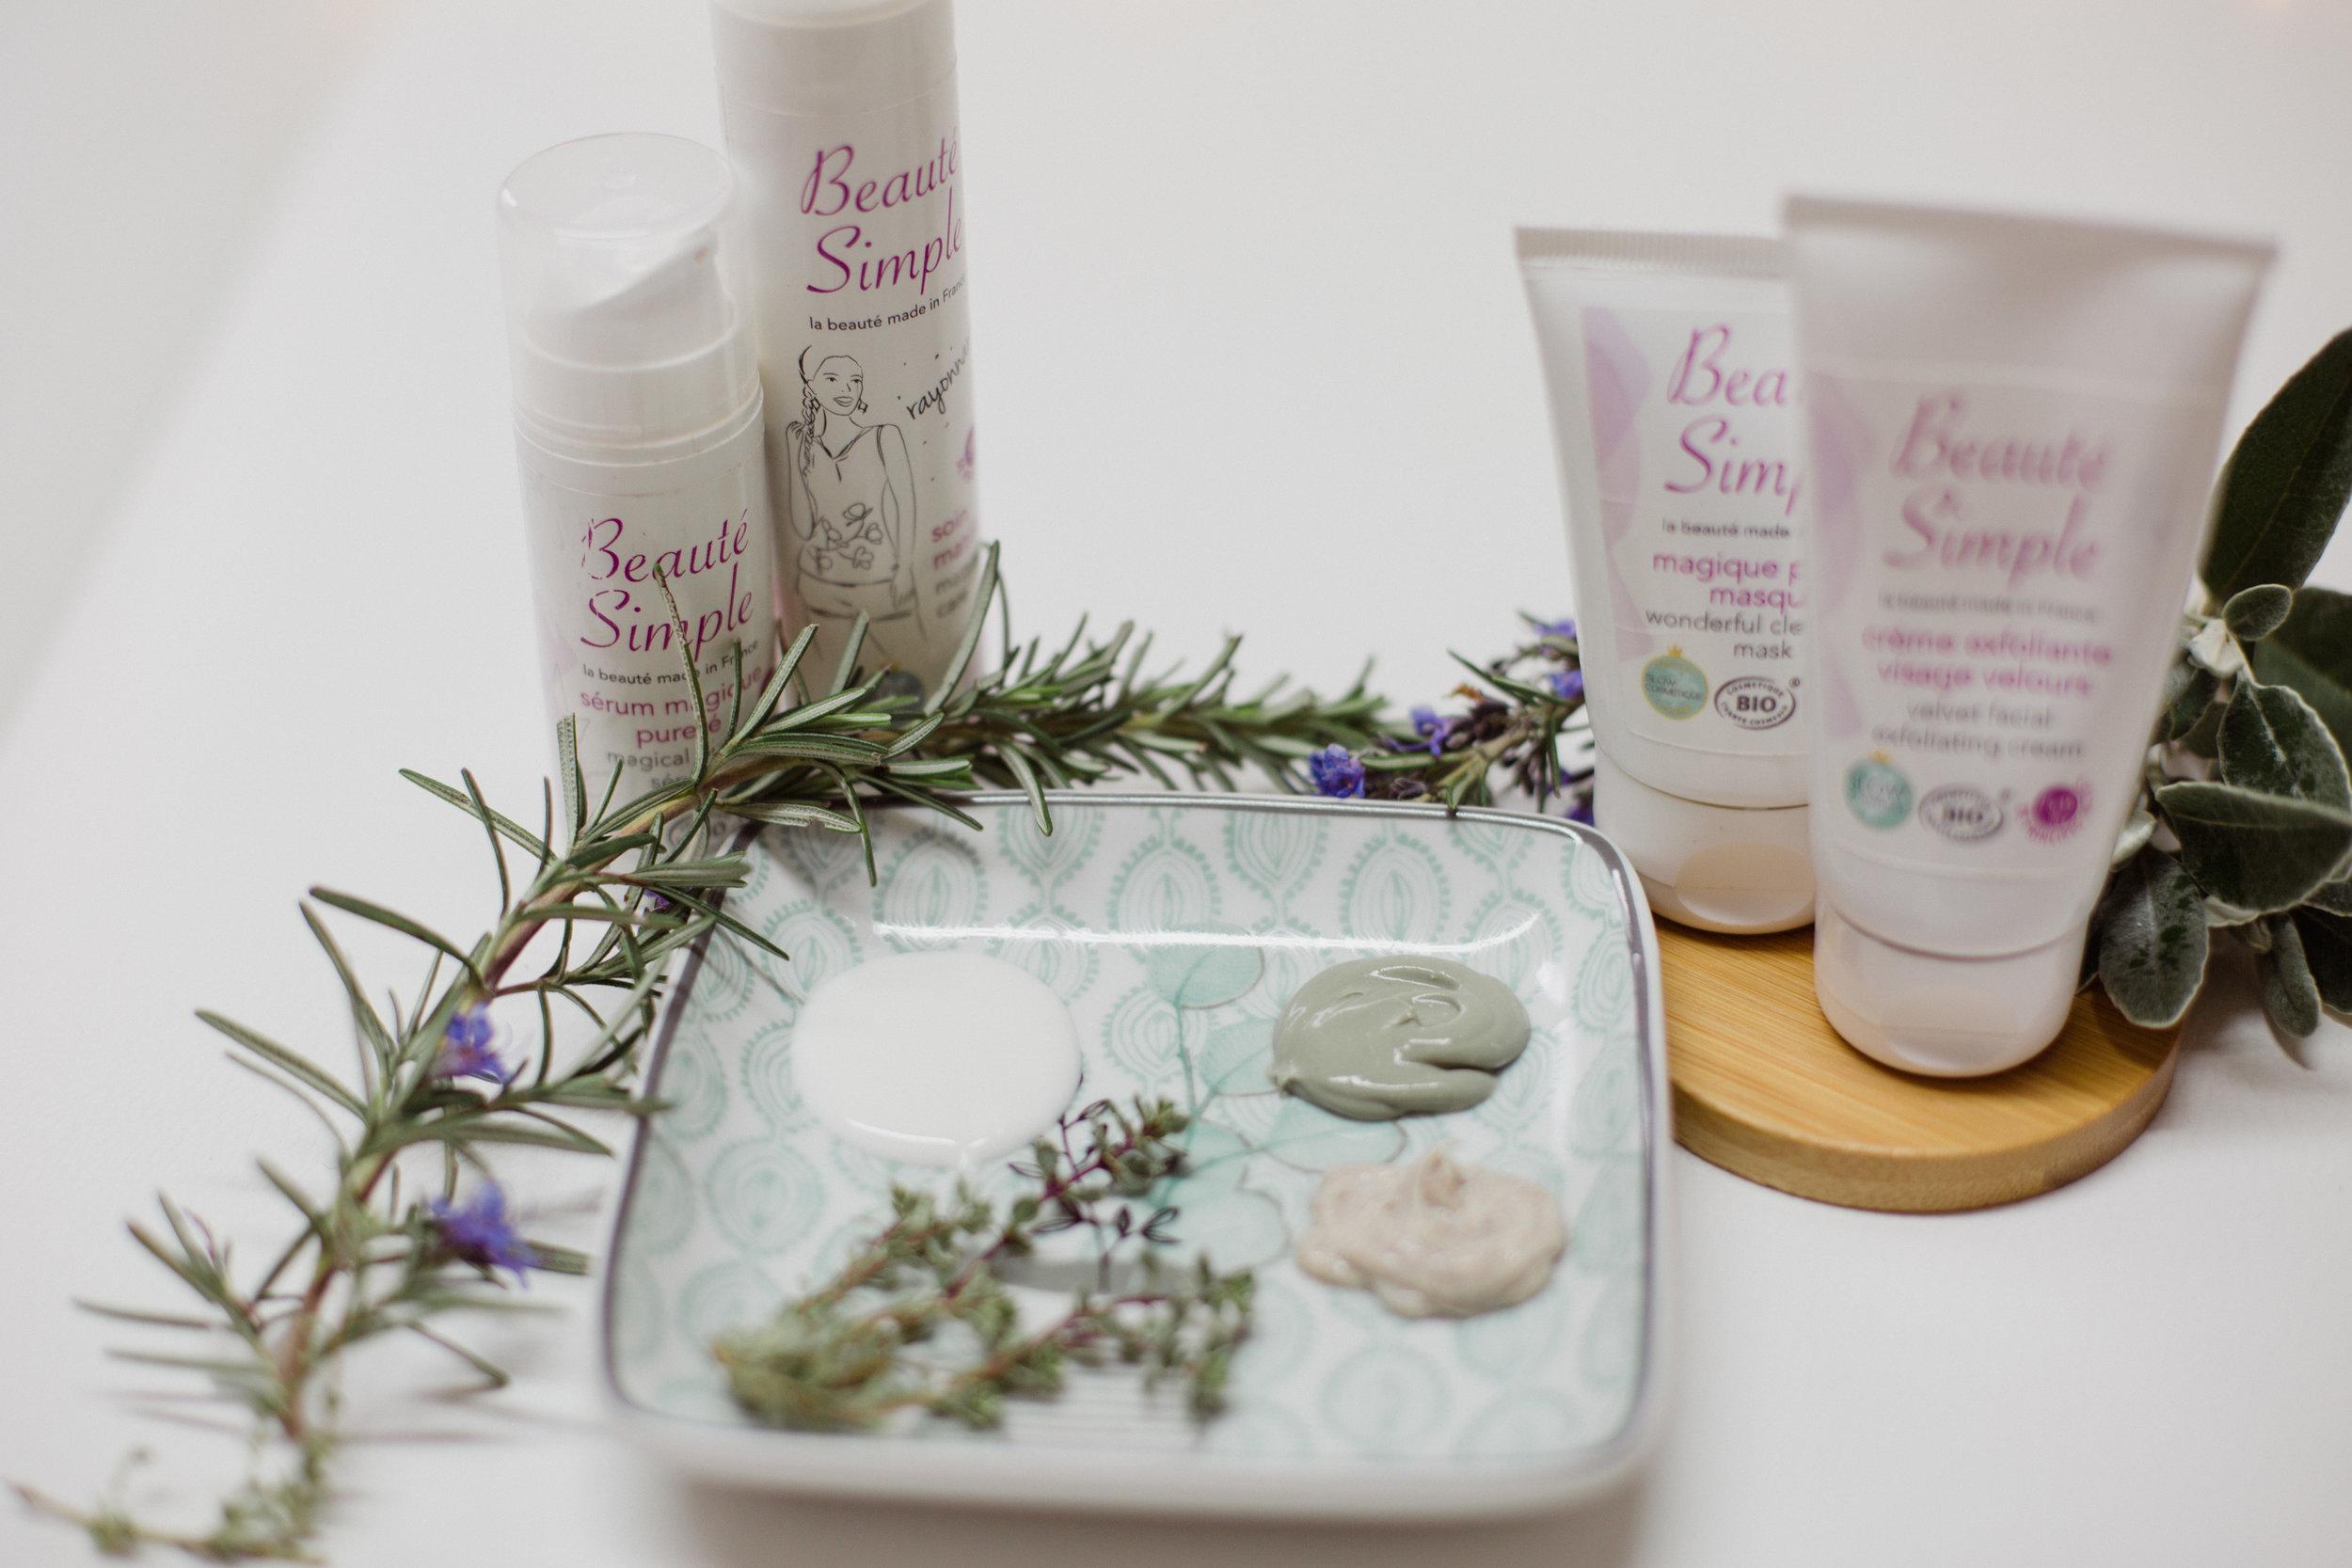 Institut Salome Dordogne Maquillage Mariage Bordeaux Dordogne Soins vegan Massages Photographe Pauline Maroussia P